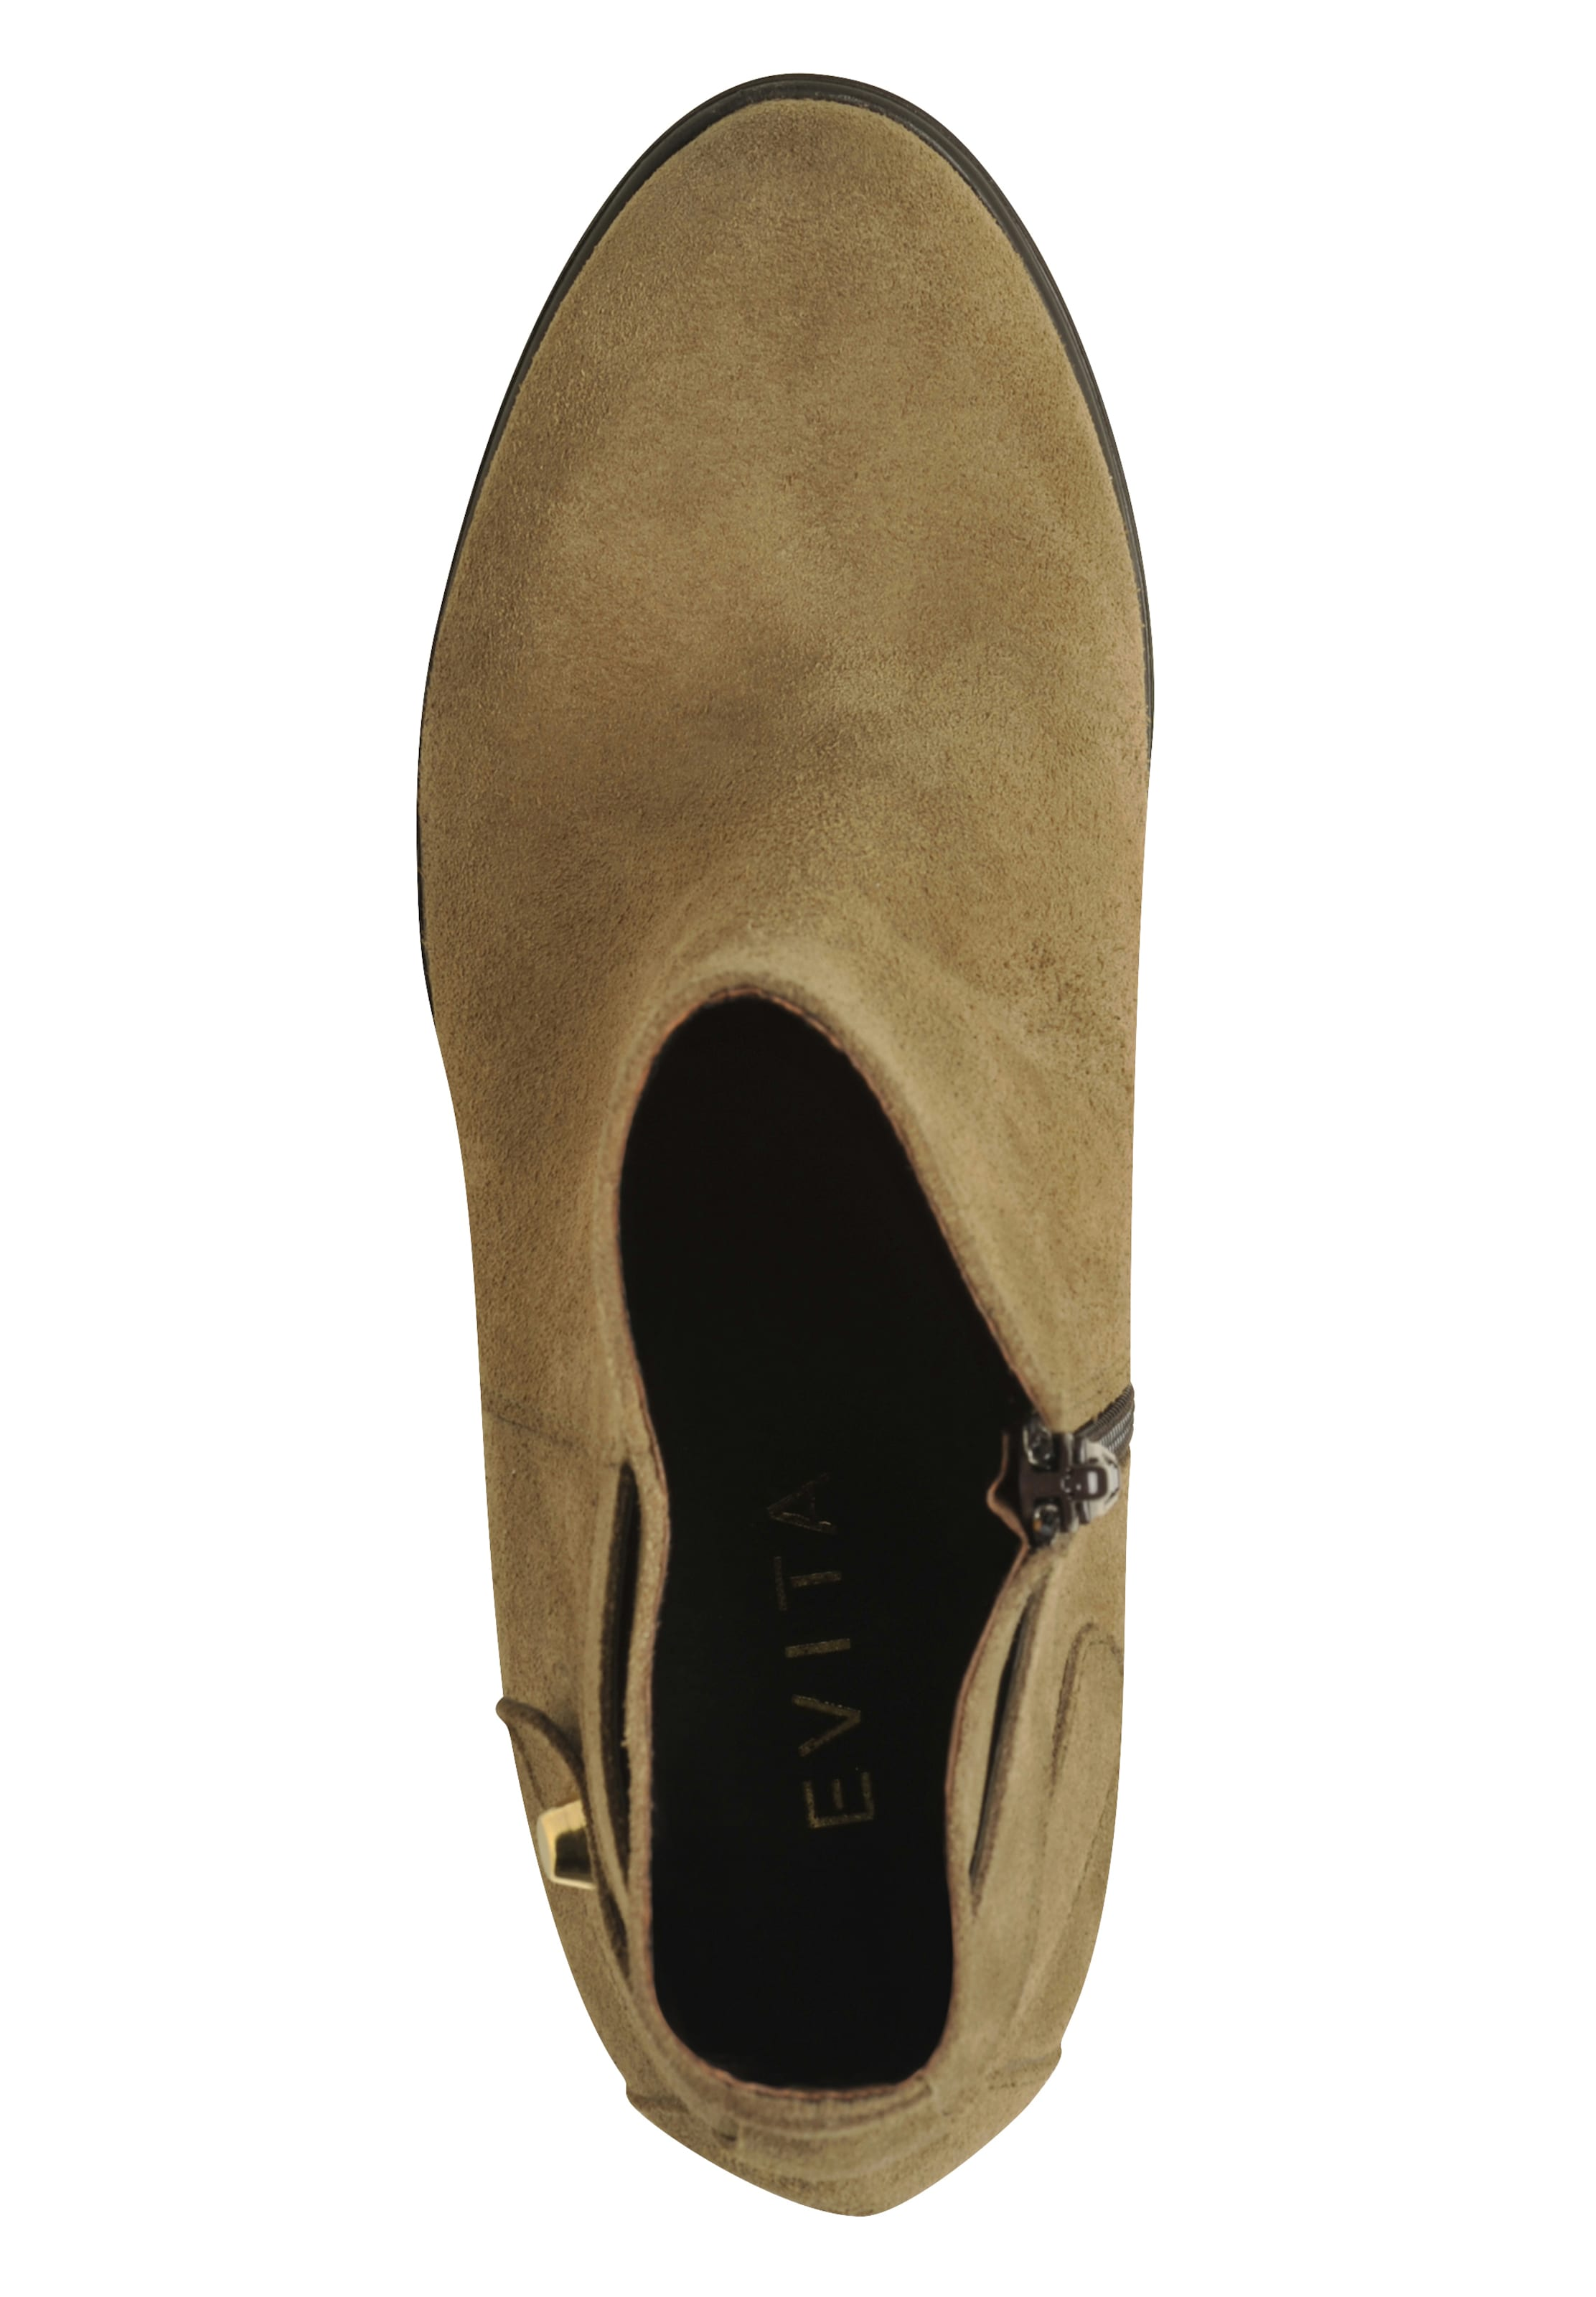 Evita In Camel Evita Stiefelette Damen NOwvm8n0